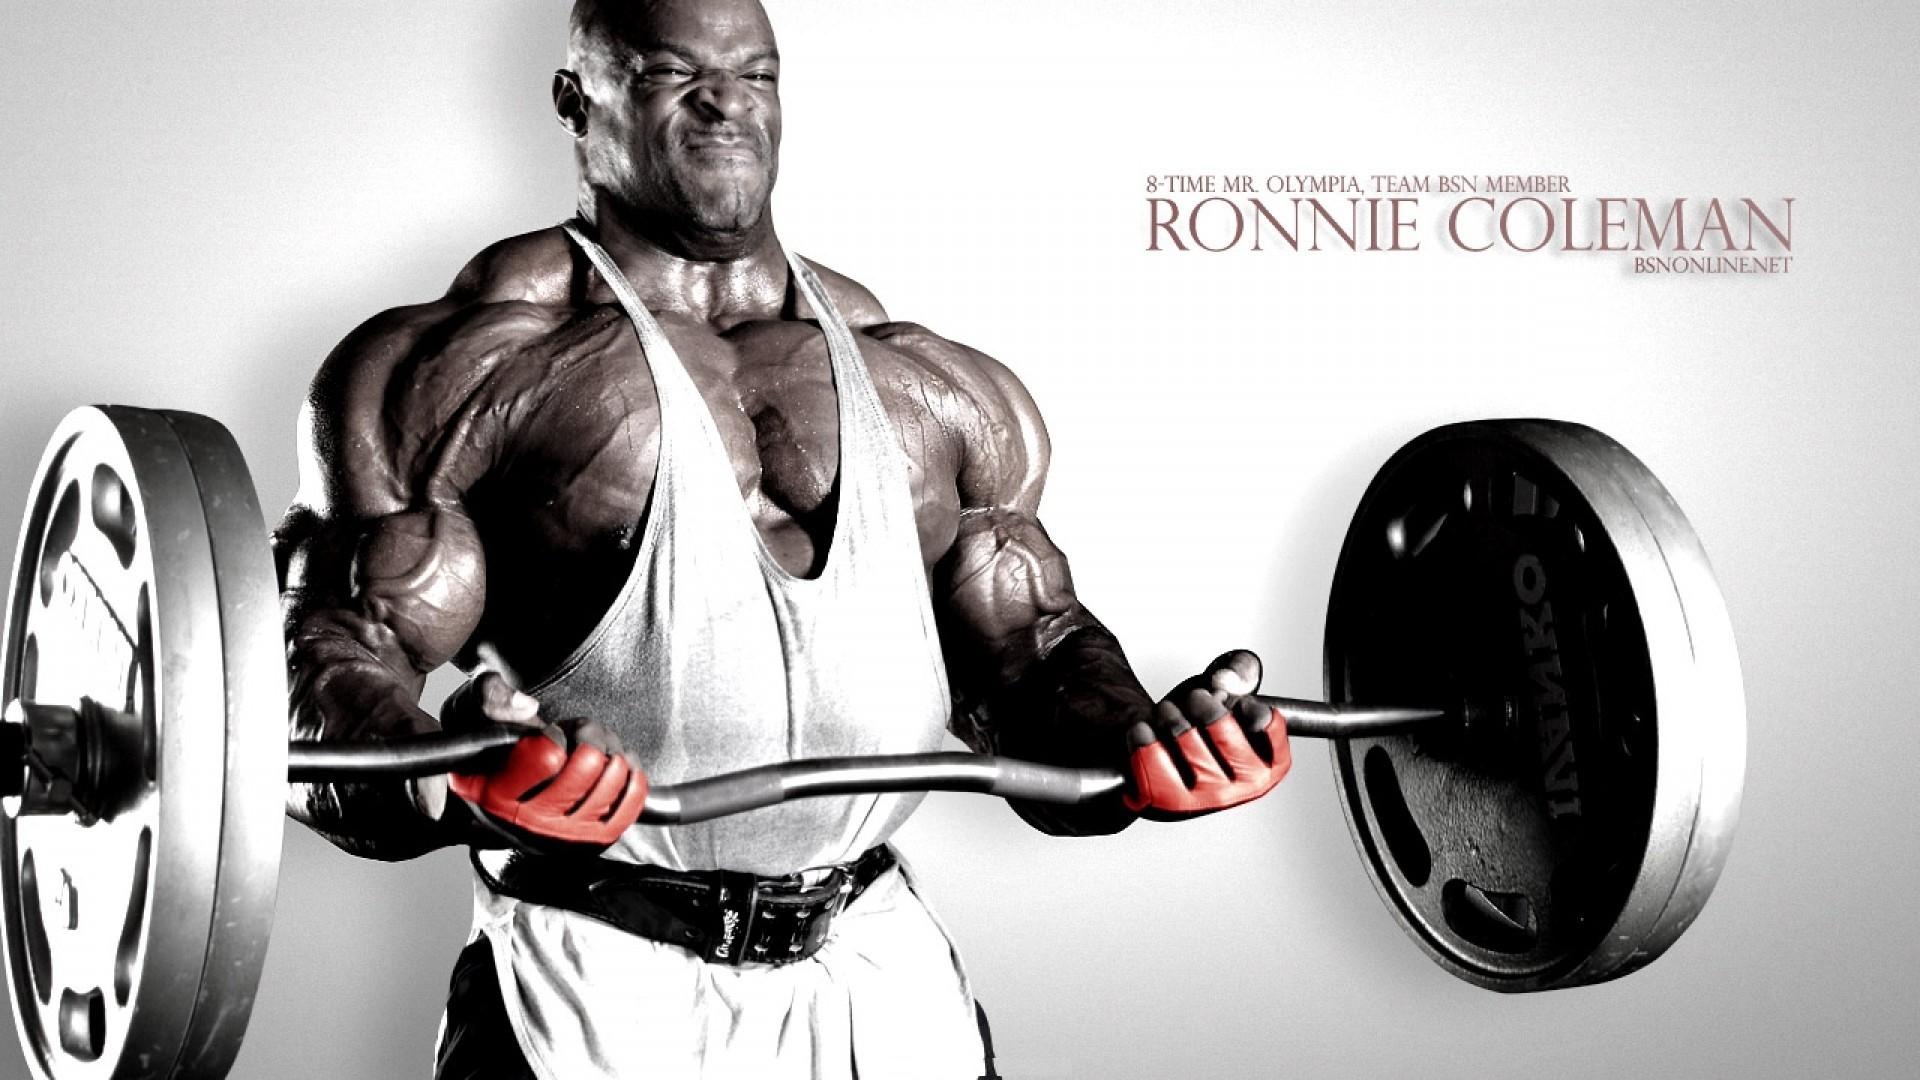 Men Bodybuilding motivation quotes images and wallpapers | HD Wallpapers |  Pinterest | Bodybuilding motivation quotes, Hd wallpaper and Wallpaper